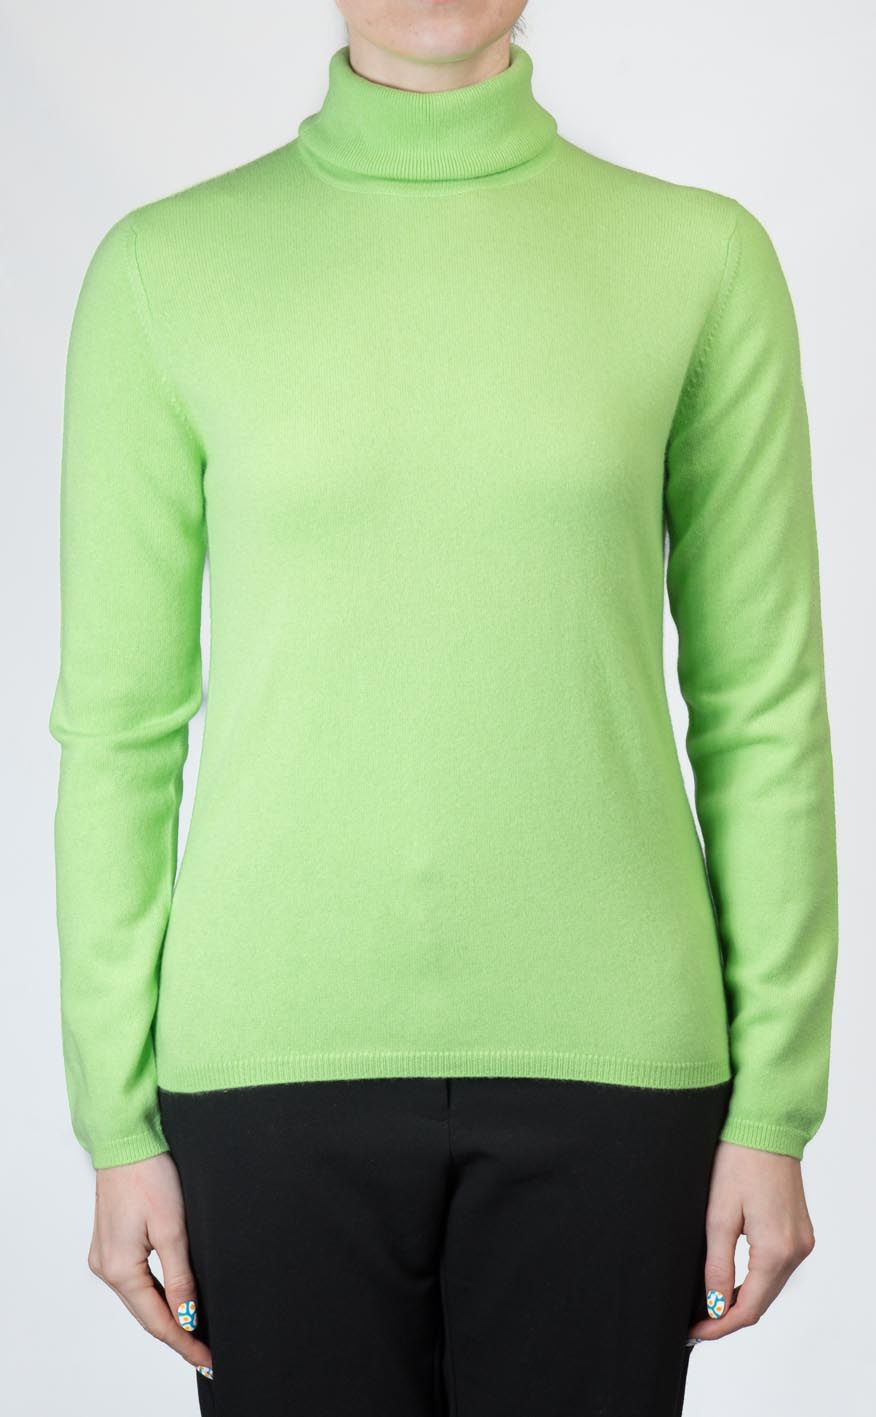 Belford Sweaters